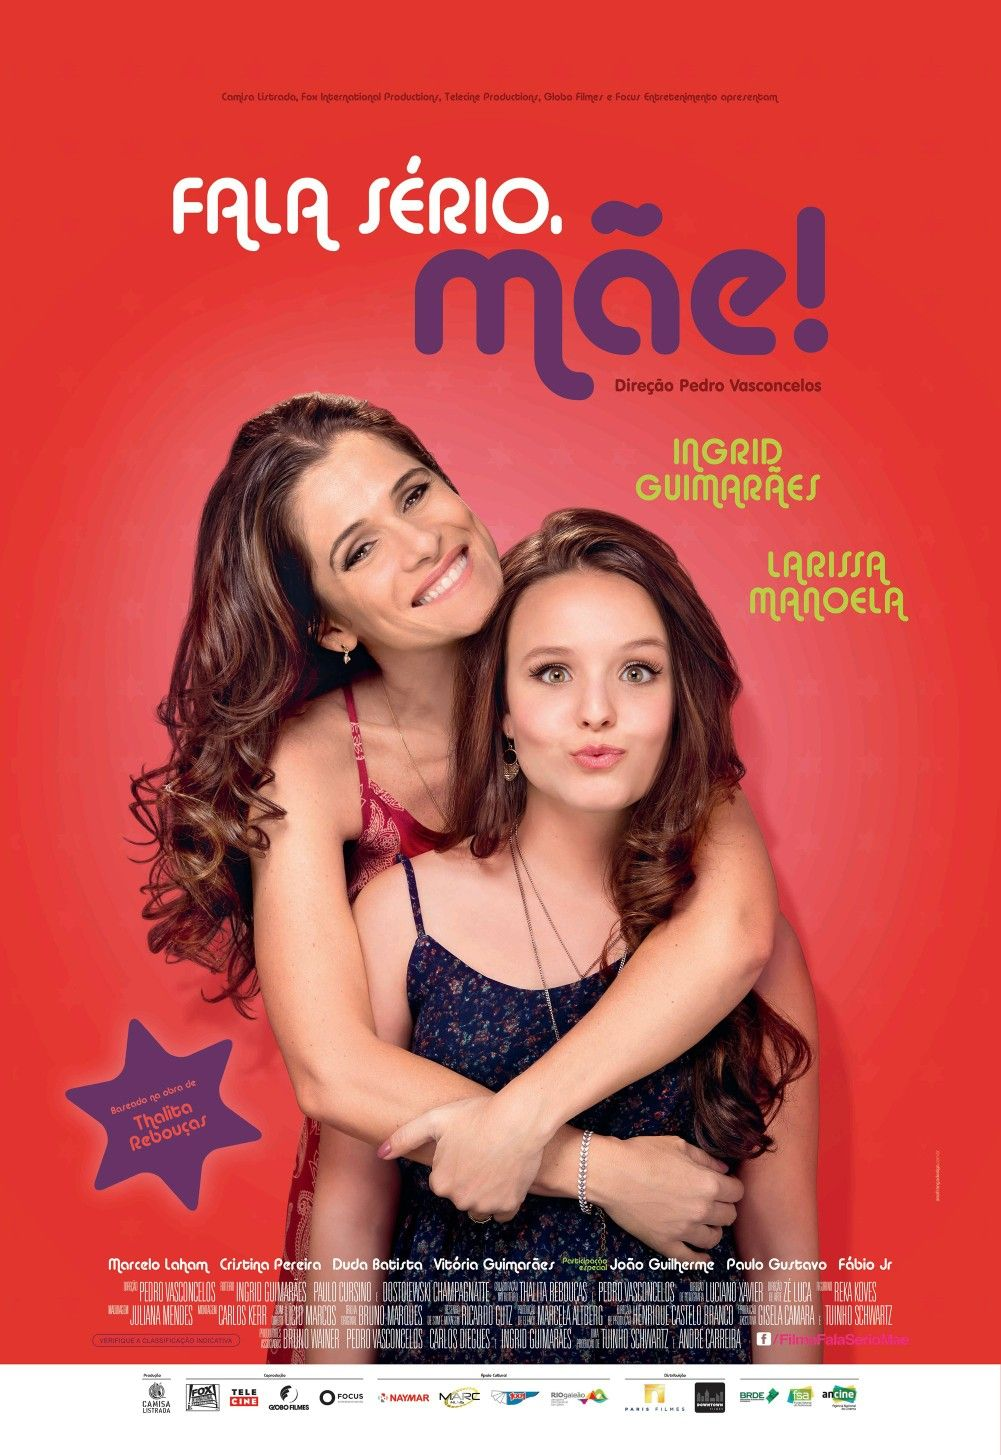 Pin By Girlaidy Barbosa On Filmes Film Movies Film Movie